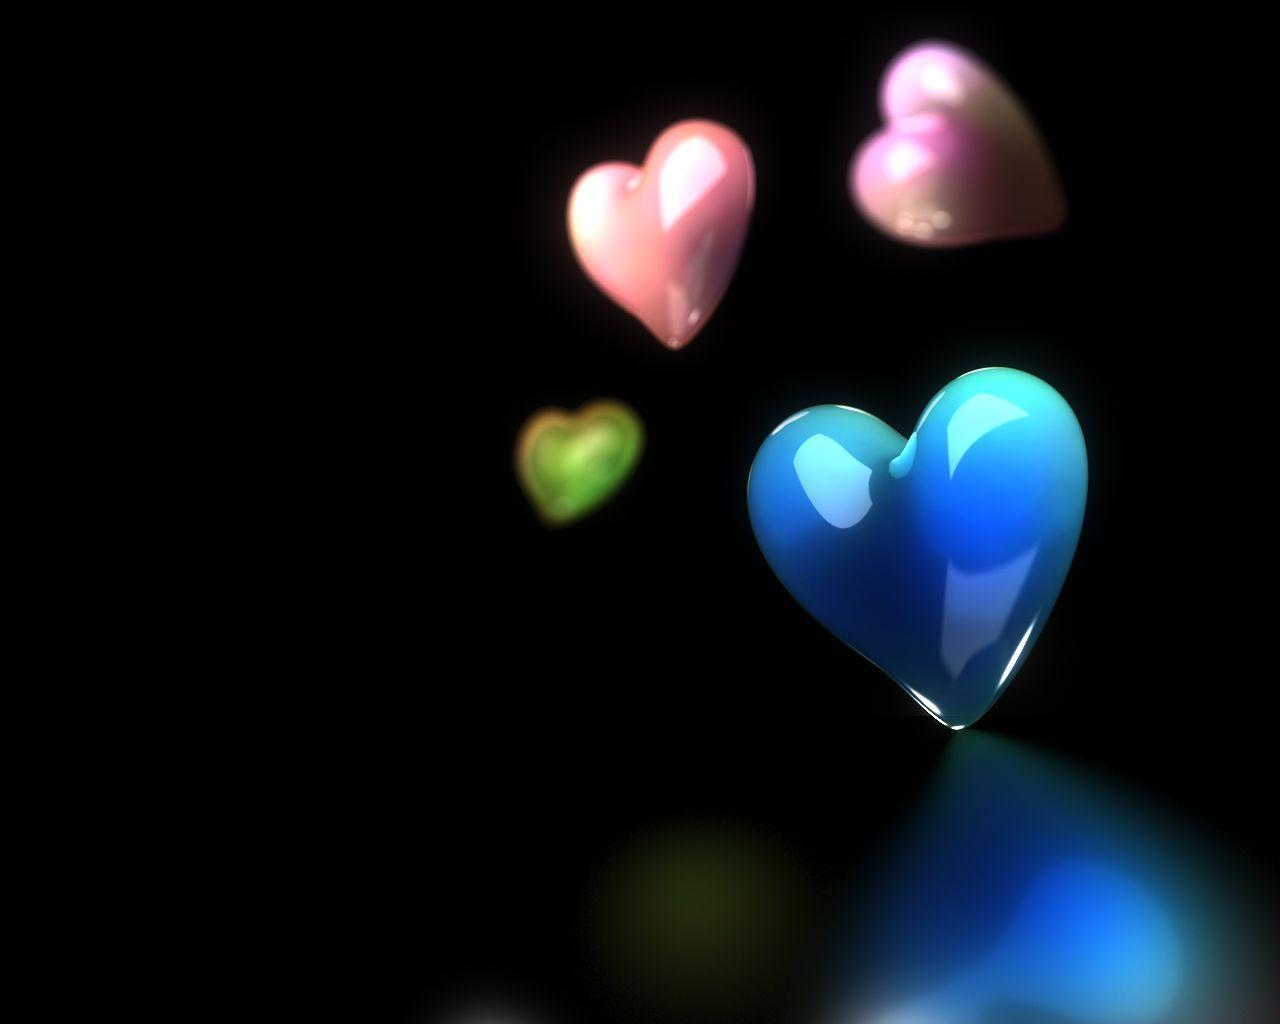 Hearts with black backgrounds wallpaper cave for Desktop animati gratis